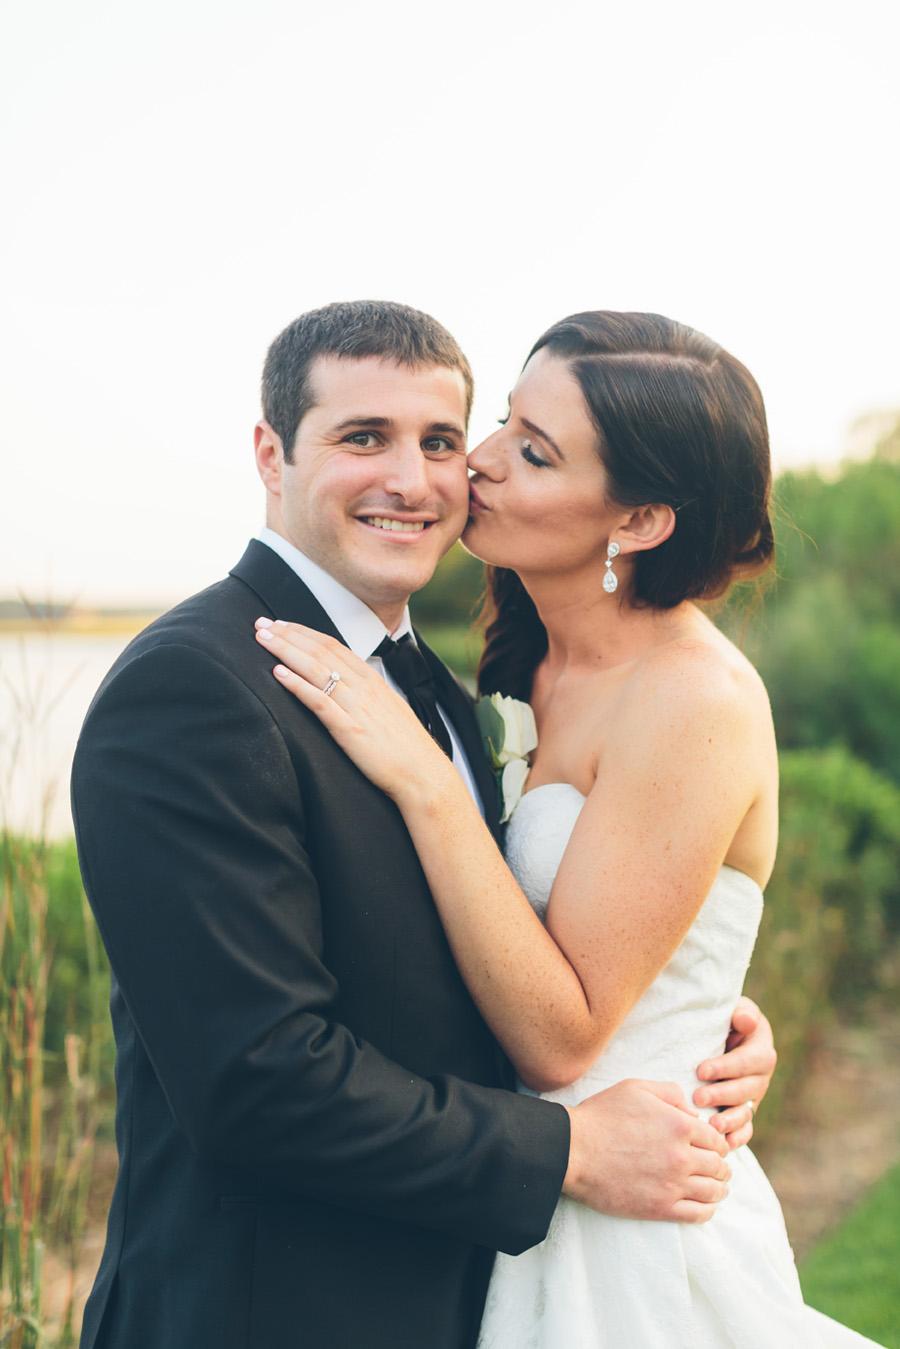 VICTORIA-BRIAN-NY-WEDDING-BRIDEGROOM-CYNTHIACHUNG-0234.jpg